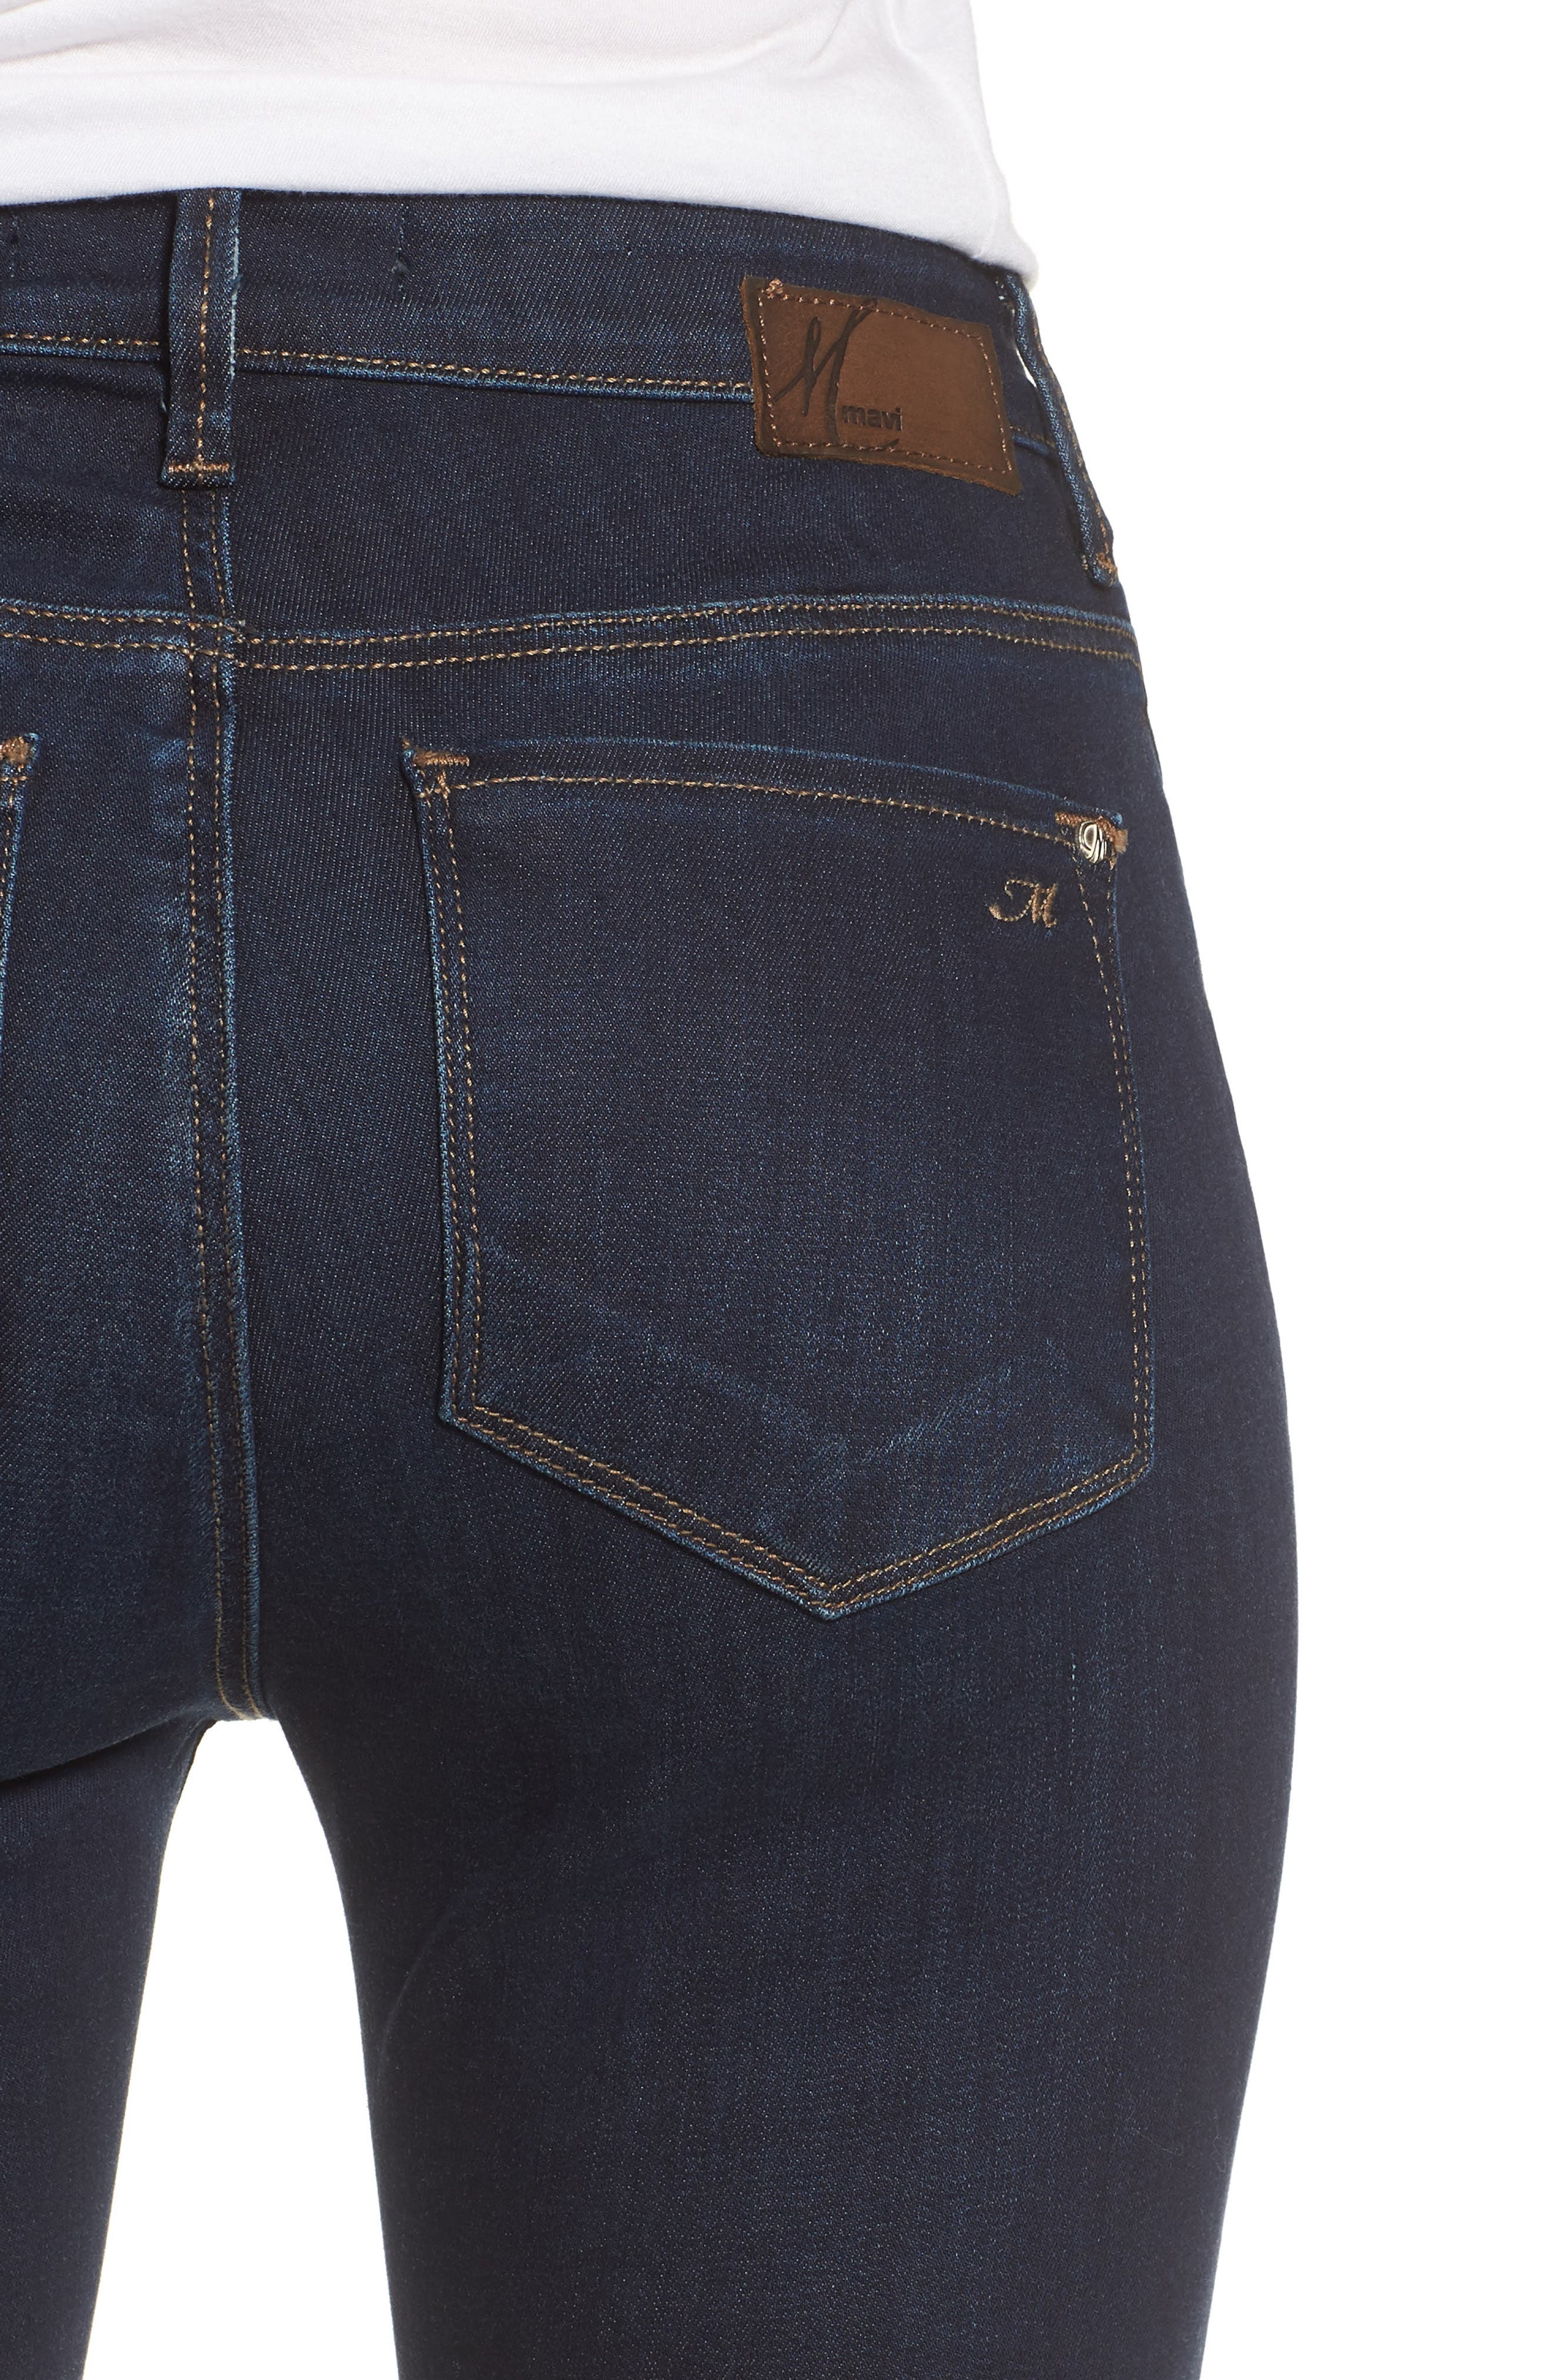 Kendra Straight Leg Jeans,                             Alternate thumbnail 4, color,                             DEEP SUPERSOFT